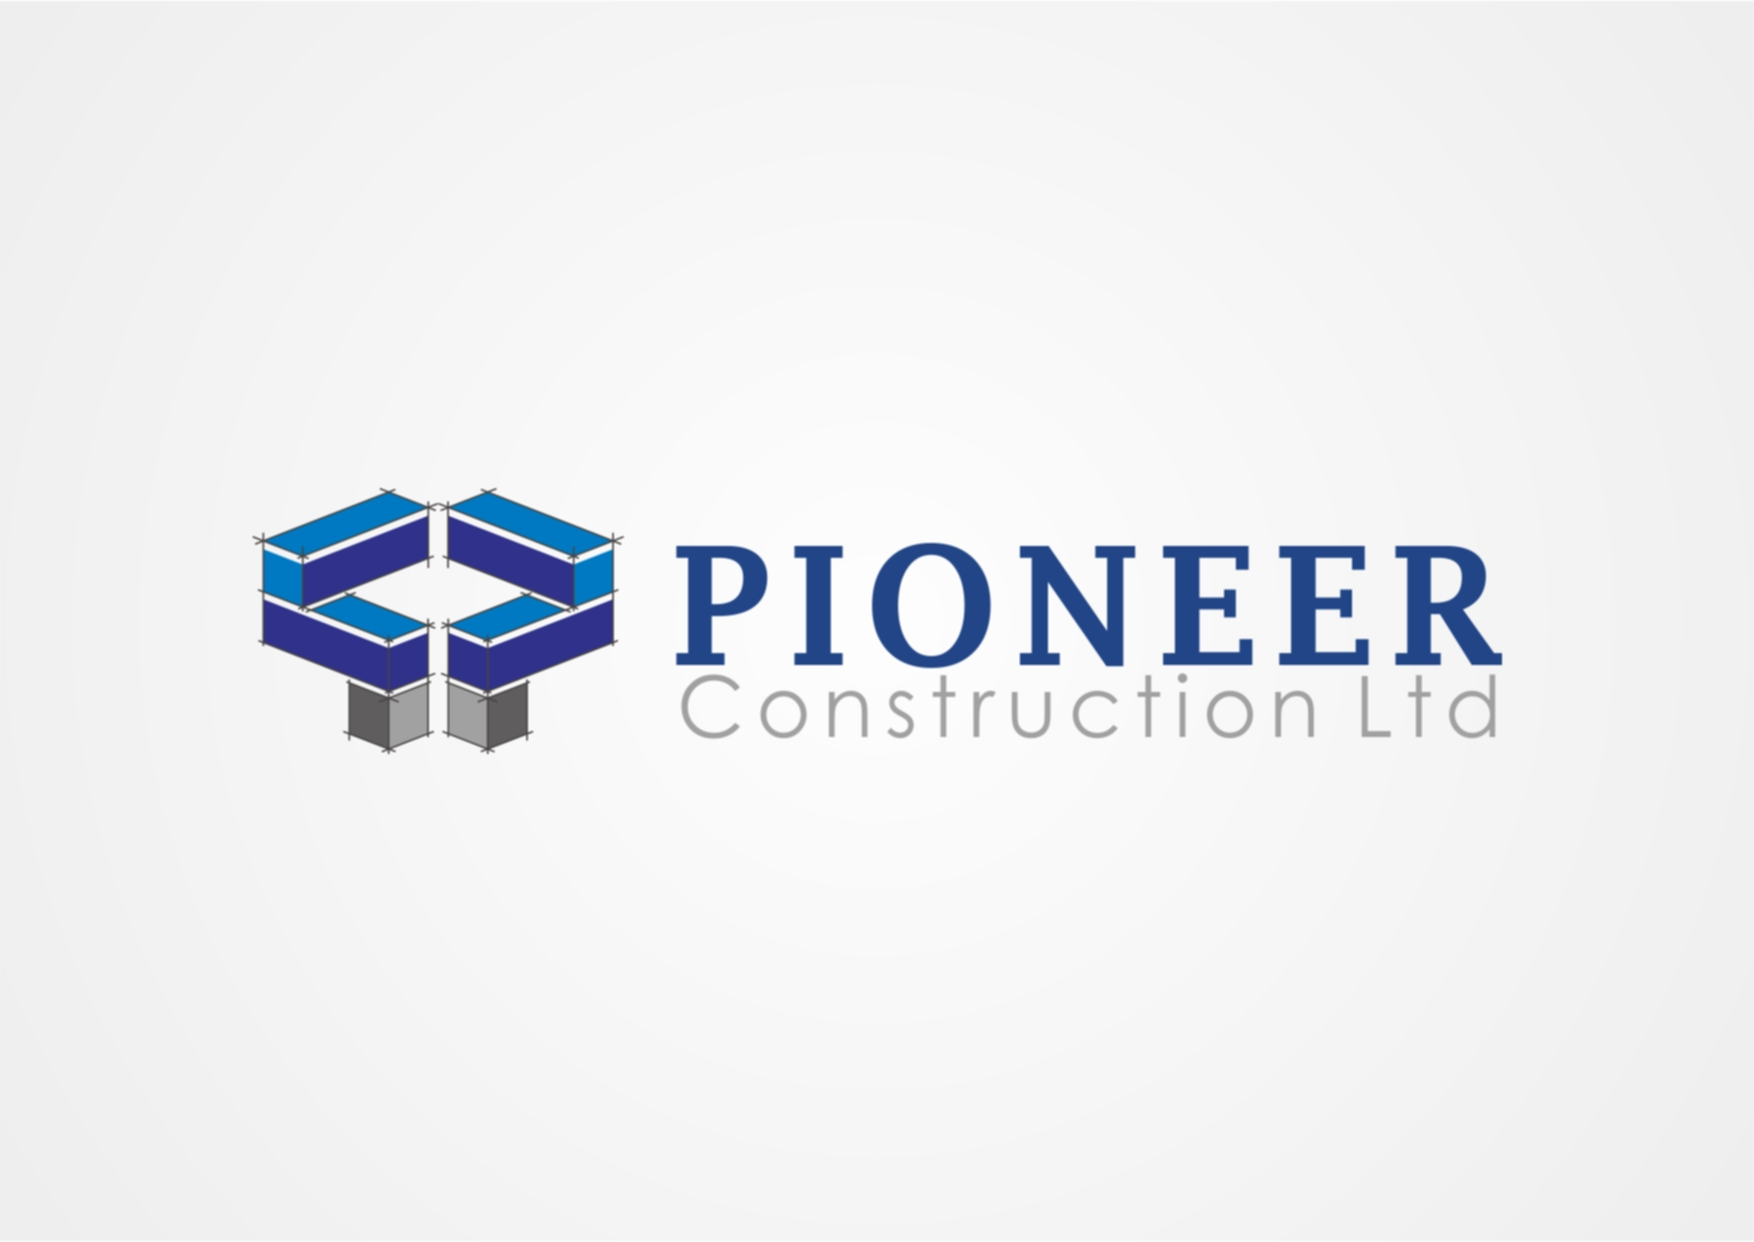 Logo Design by Private User - Entry No. 49 in the Logo Design Contest Imaginative Logo Design for  Pioneer Construction Ltd.